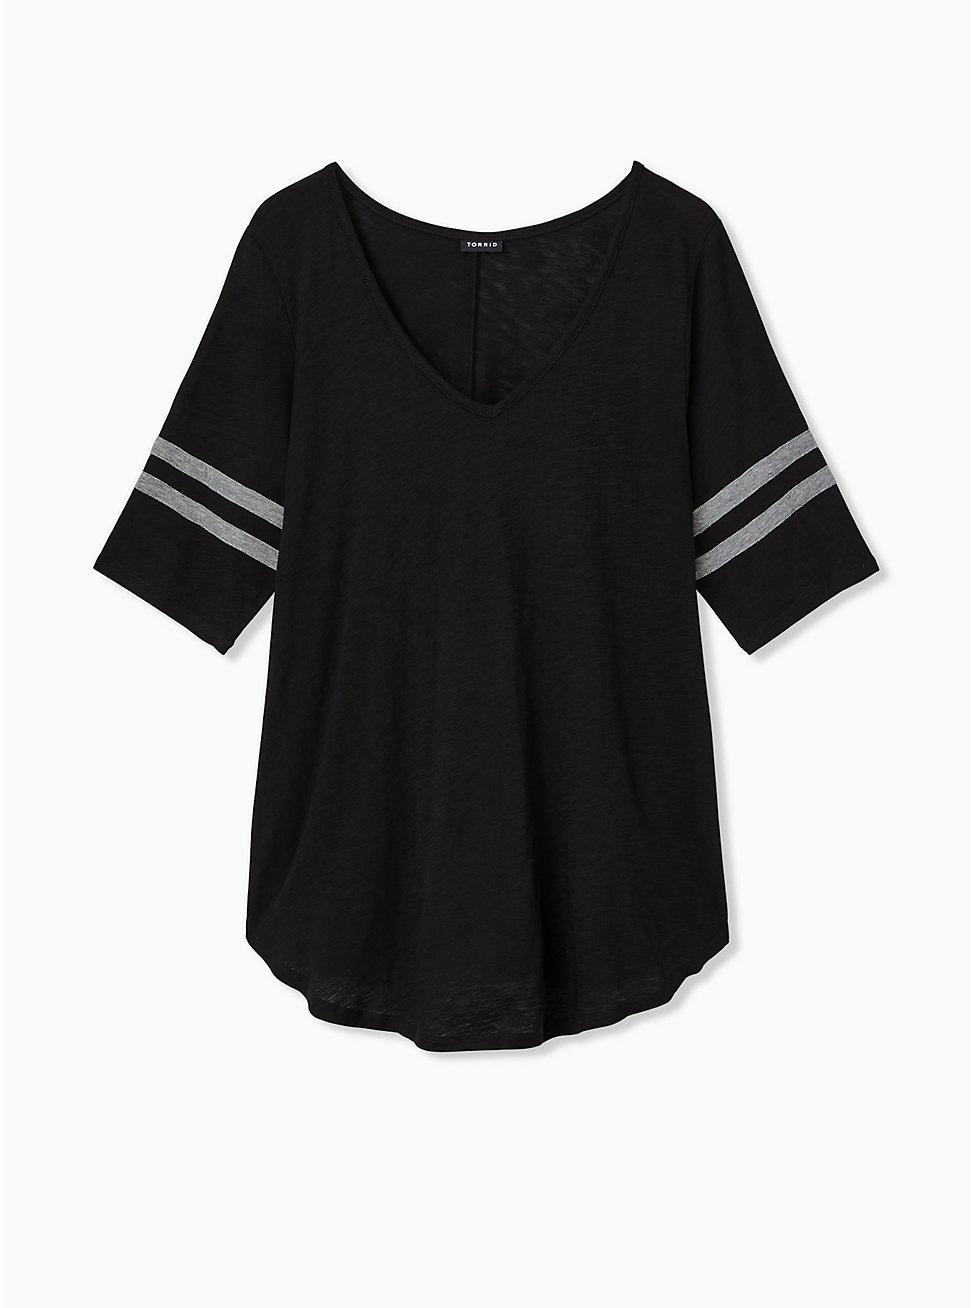 Plus Size Slim Fit V-Neck Tunic Tee - Heritage Slub Varsity Stripes Black, DEEP BLACK, hi-res